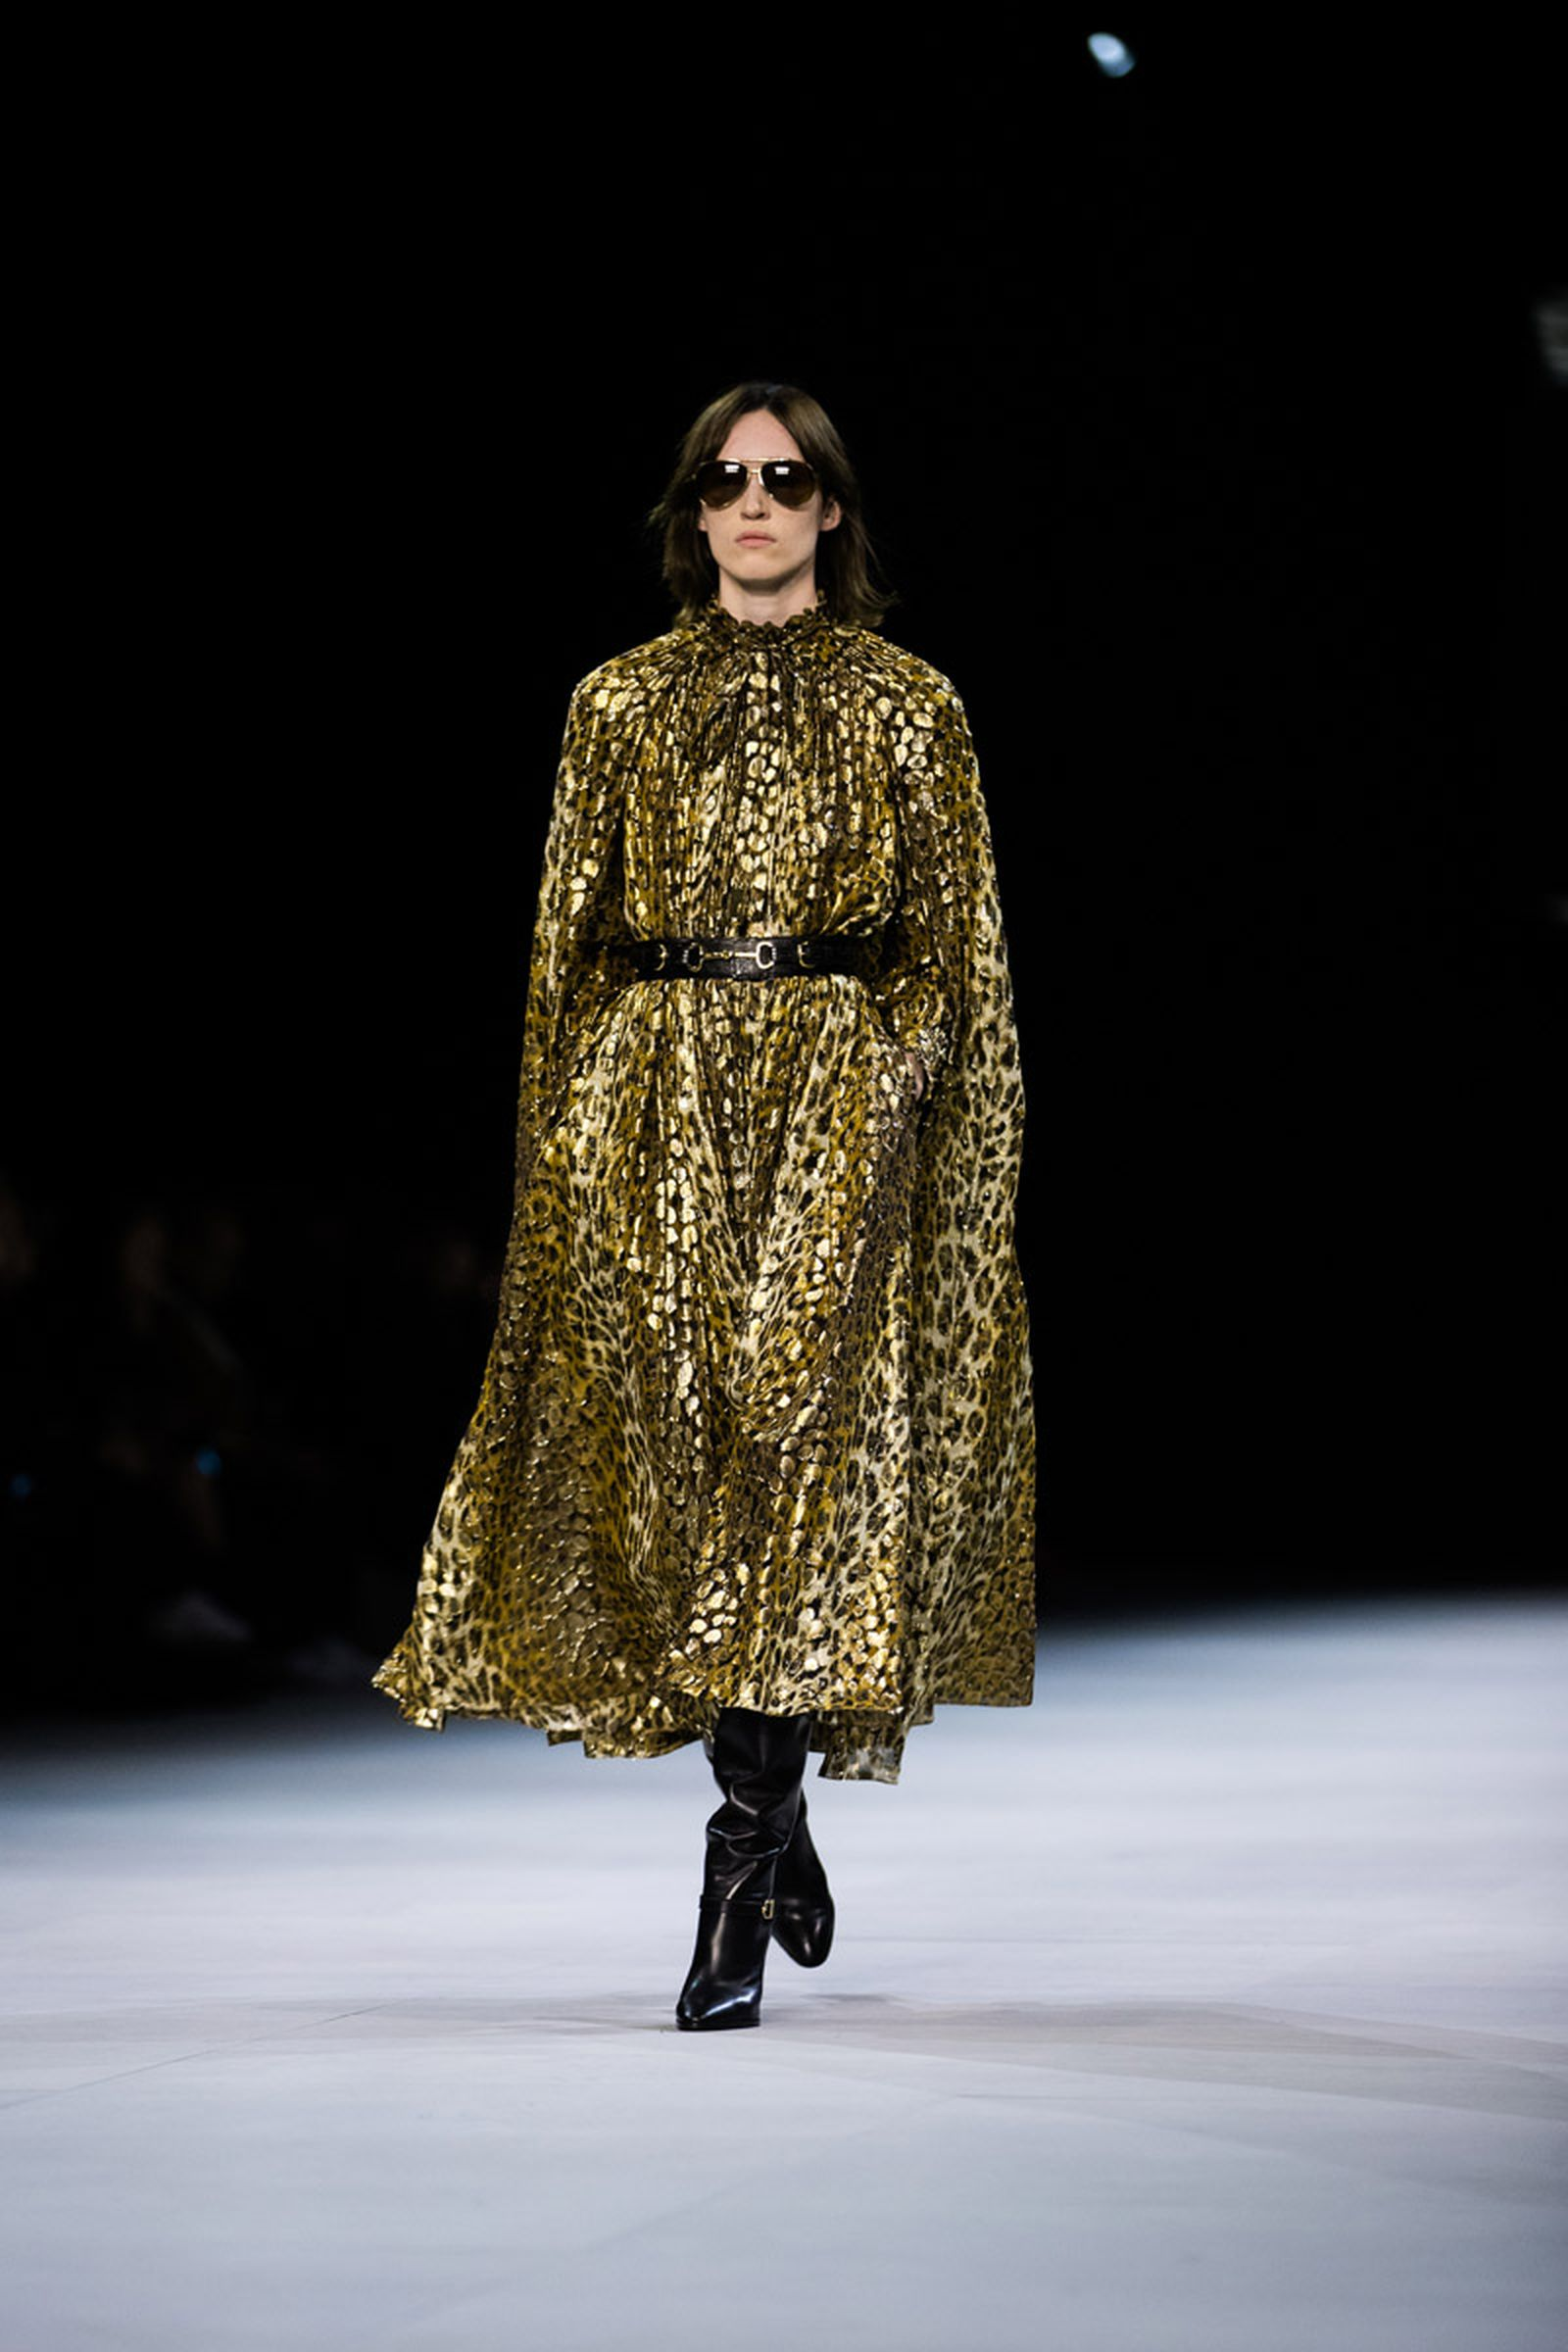 7celine fw19 womens paris fashion week